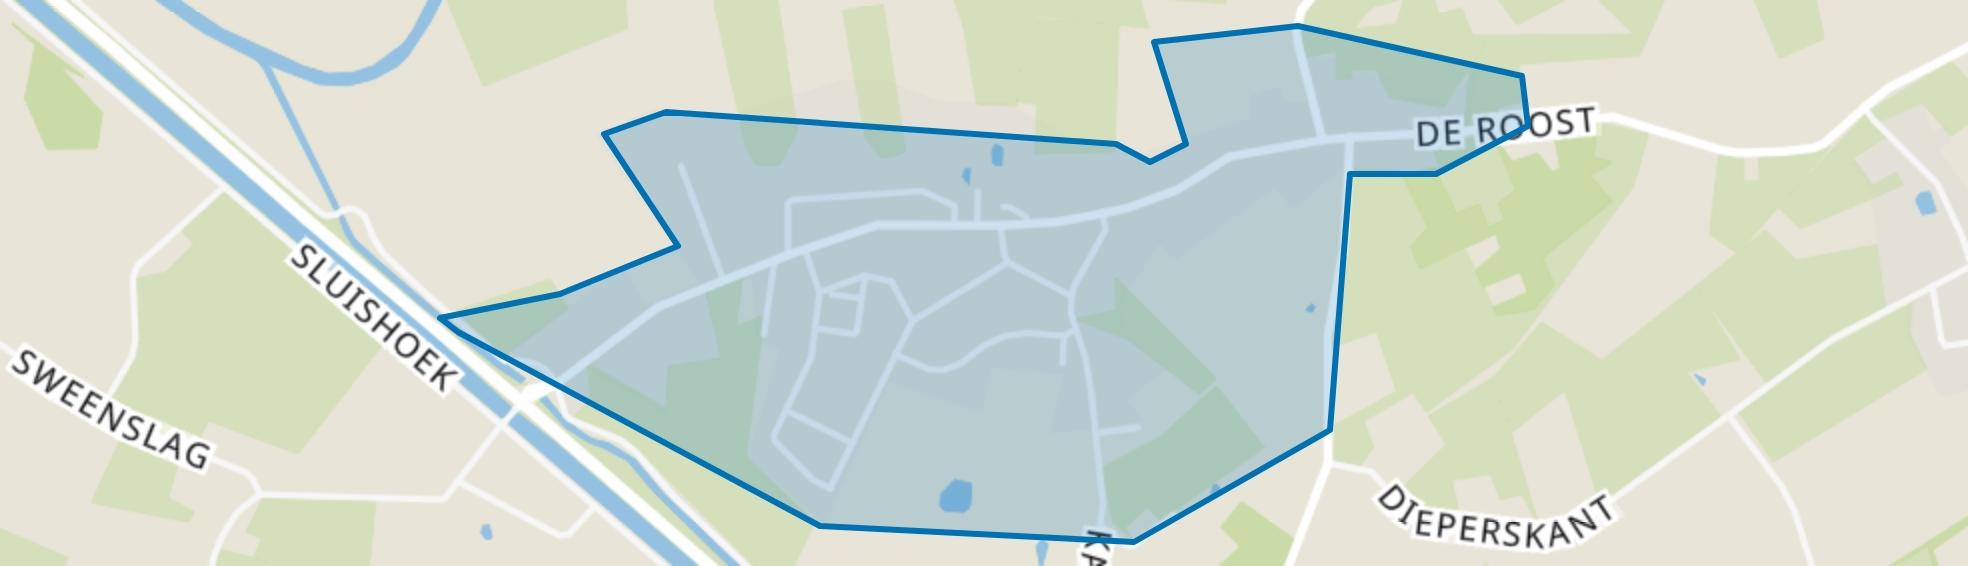 Keldonk, Erp map